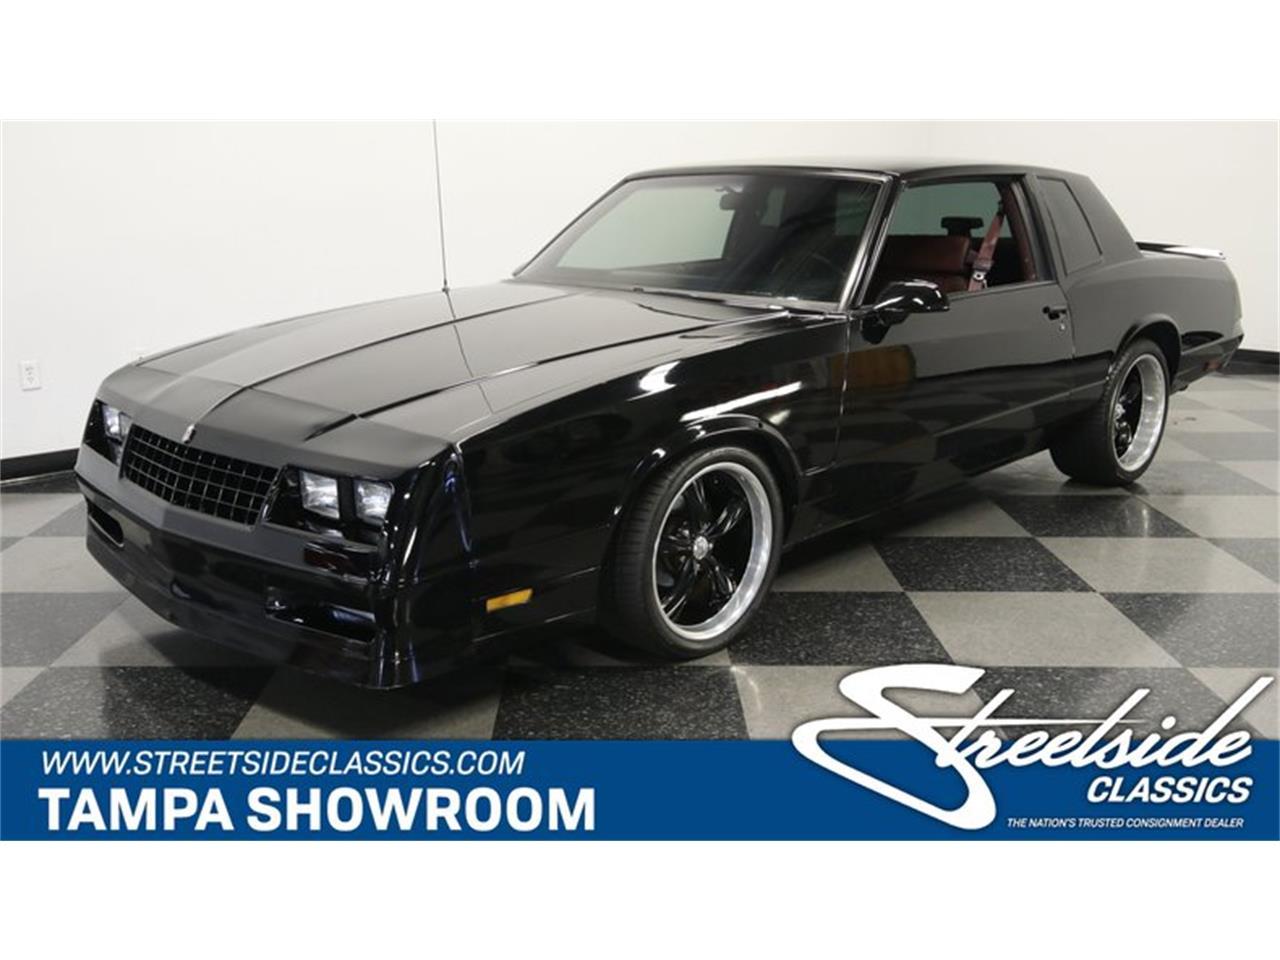 1987 Chevrolet Monte Carlo (CC-1415710) for sale in Lutz, Florida